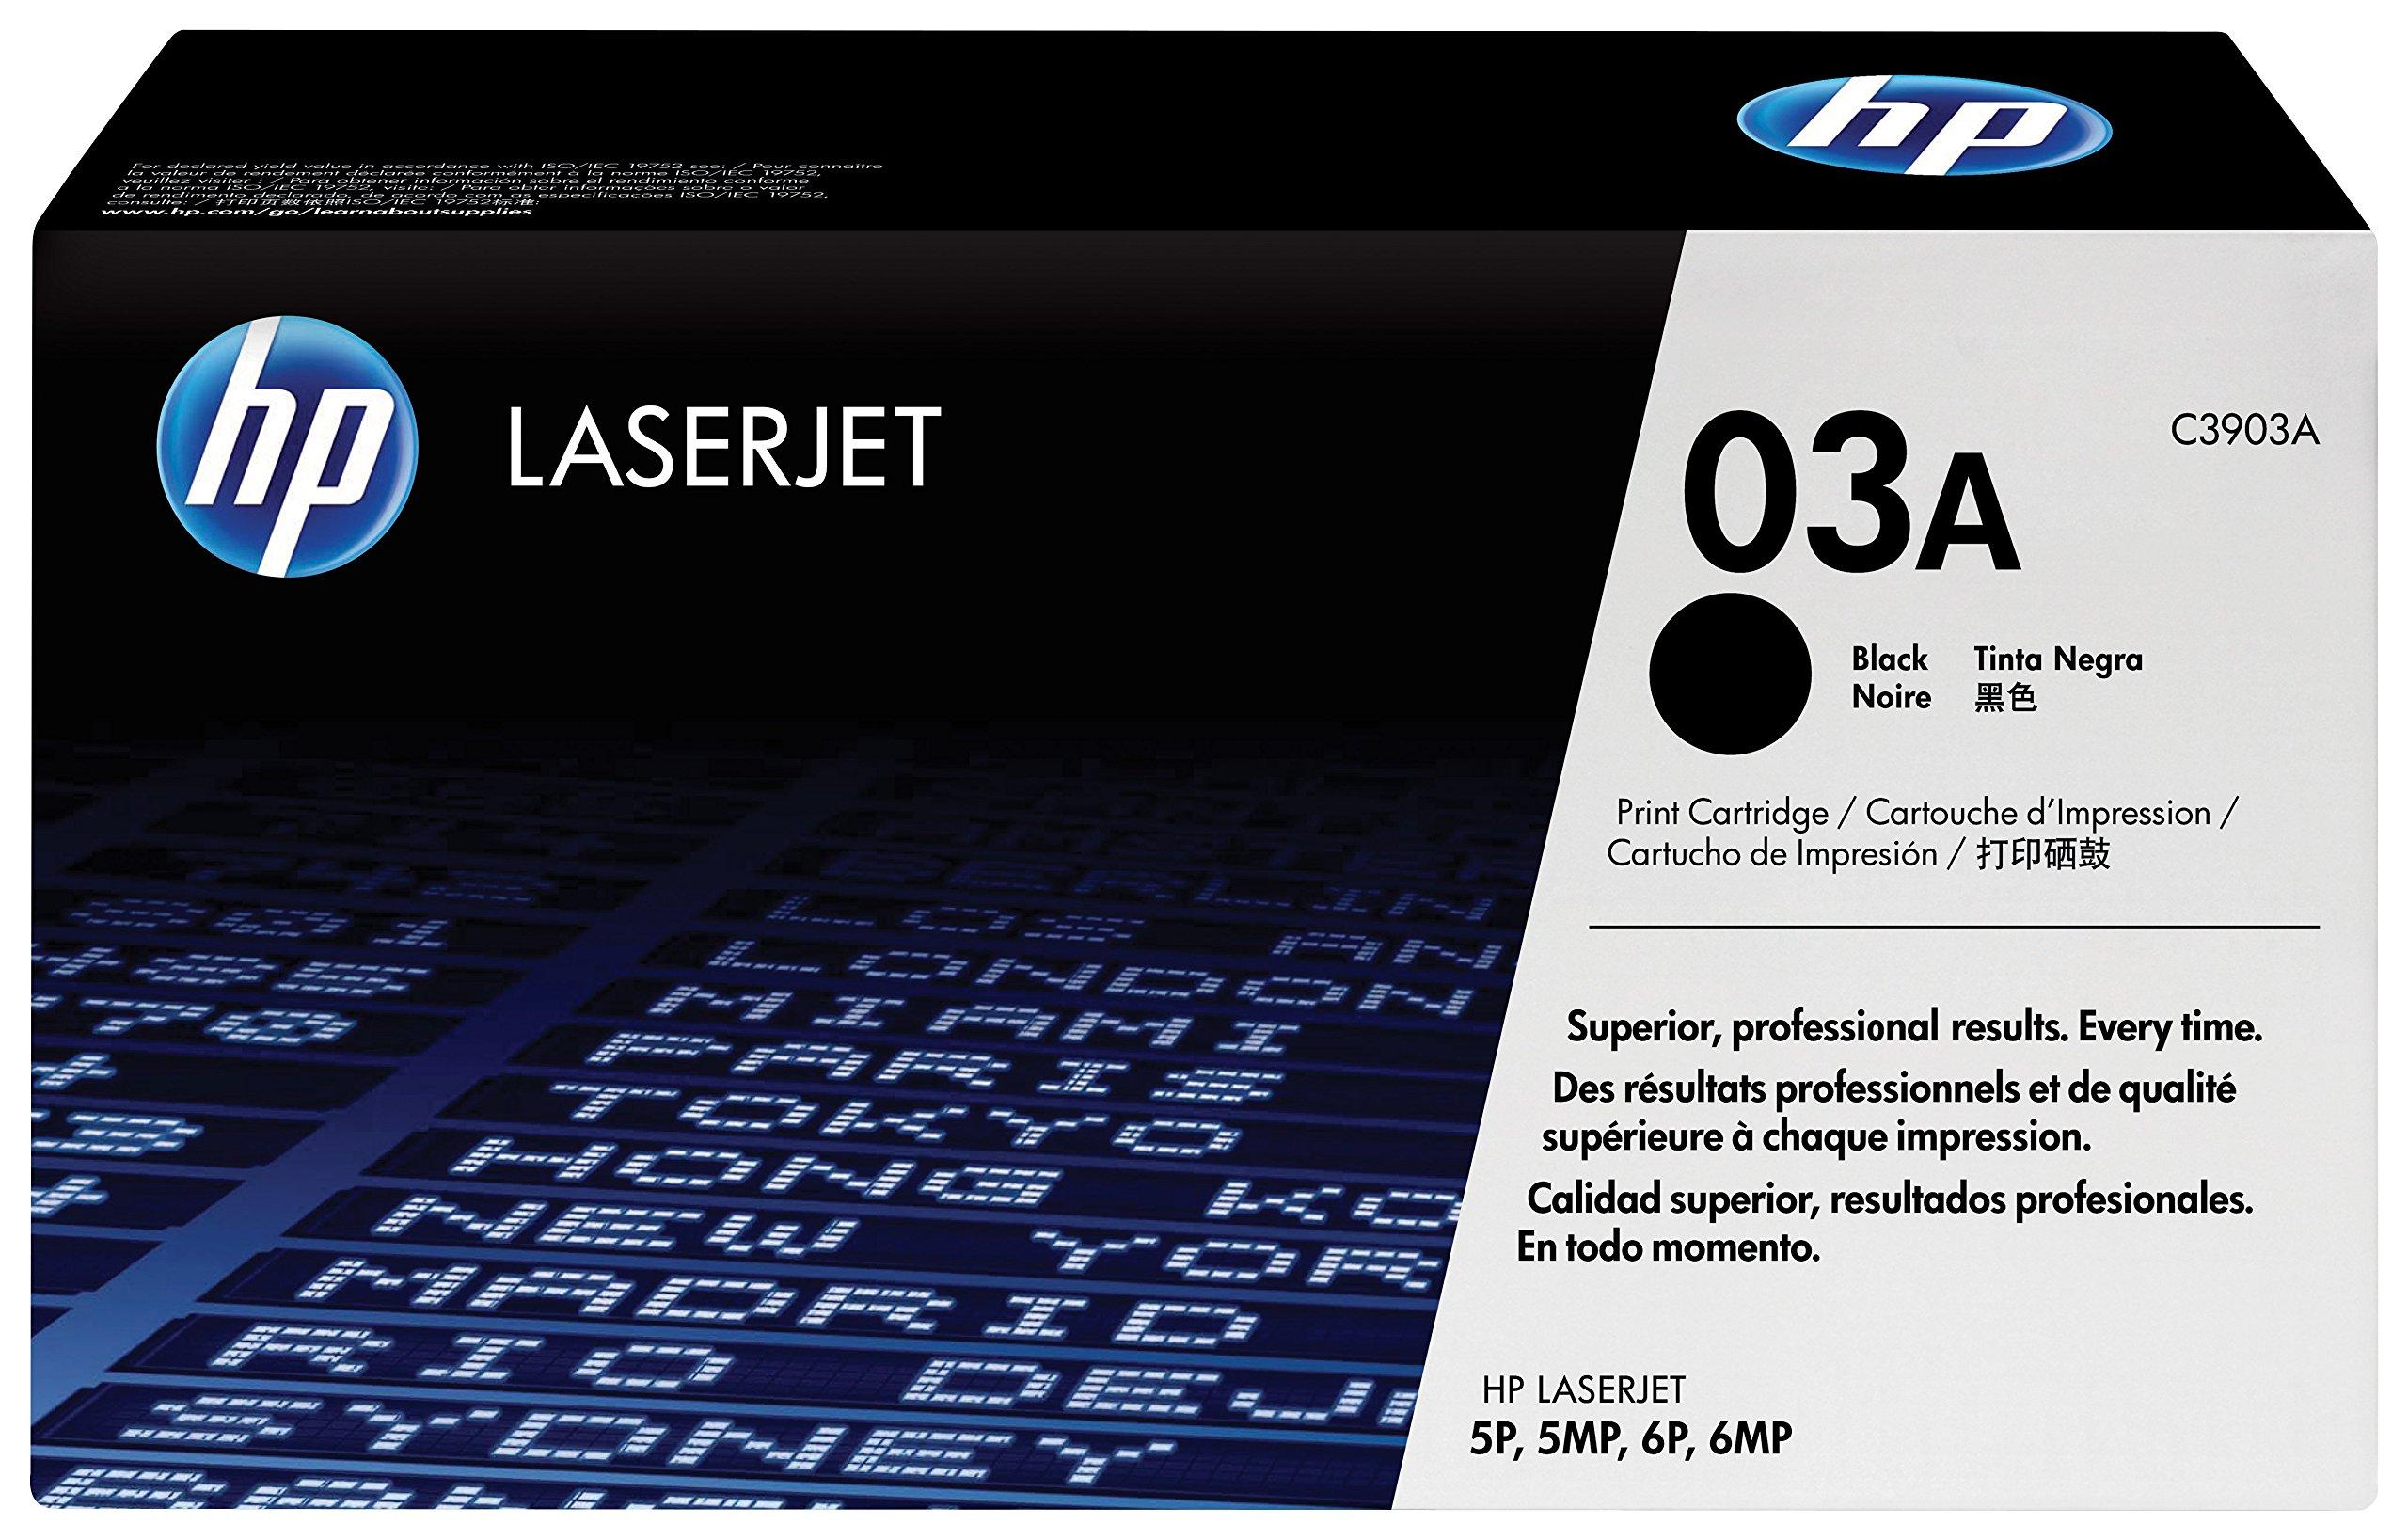 HP-03A-C3903A-Schwarz-Original-Toner-fr-HP-Laserjet-5-HP-Laserjet-6